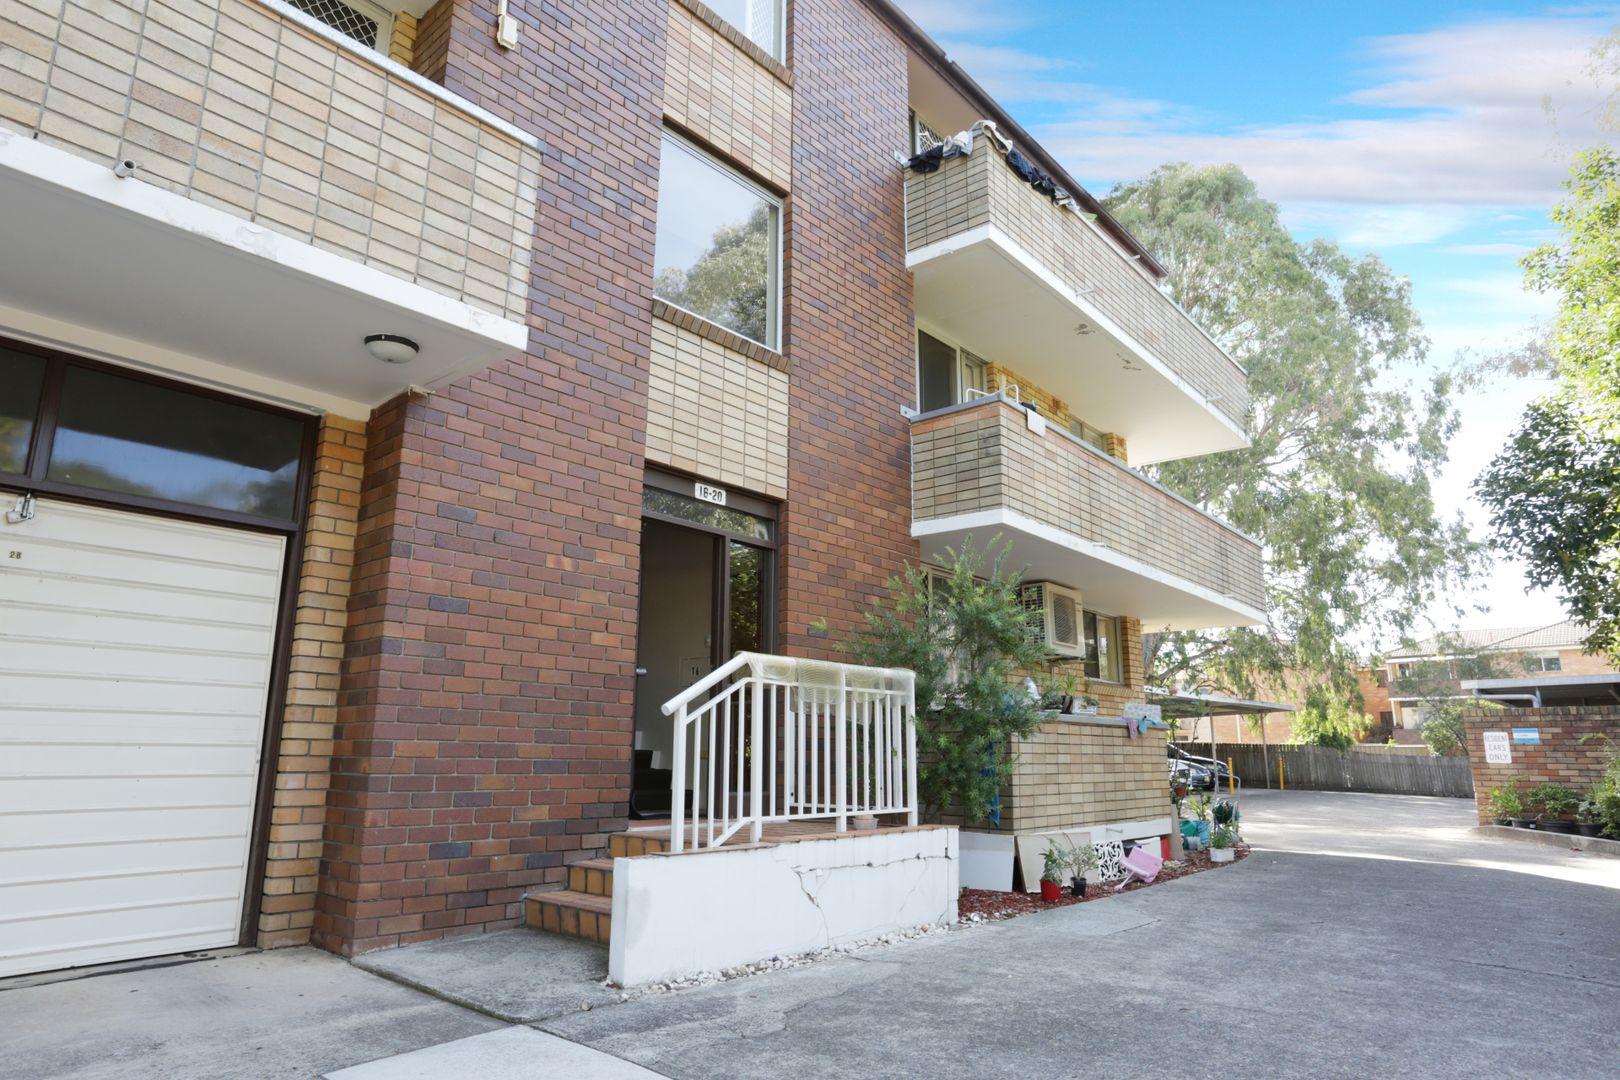 19/23 Ann Street, Merrylands NSW 2160, Image 0